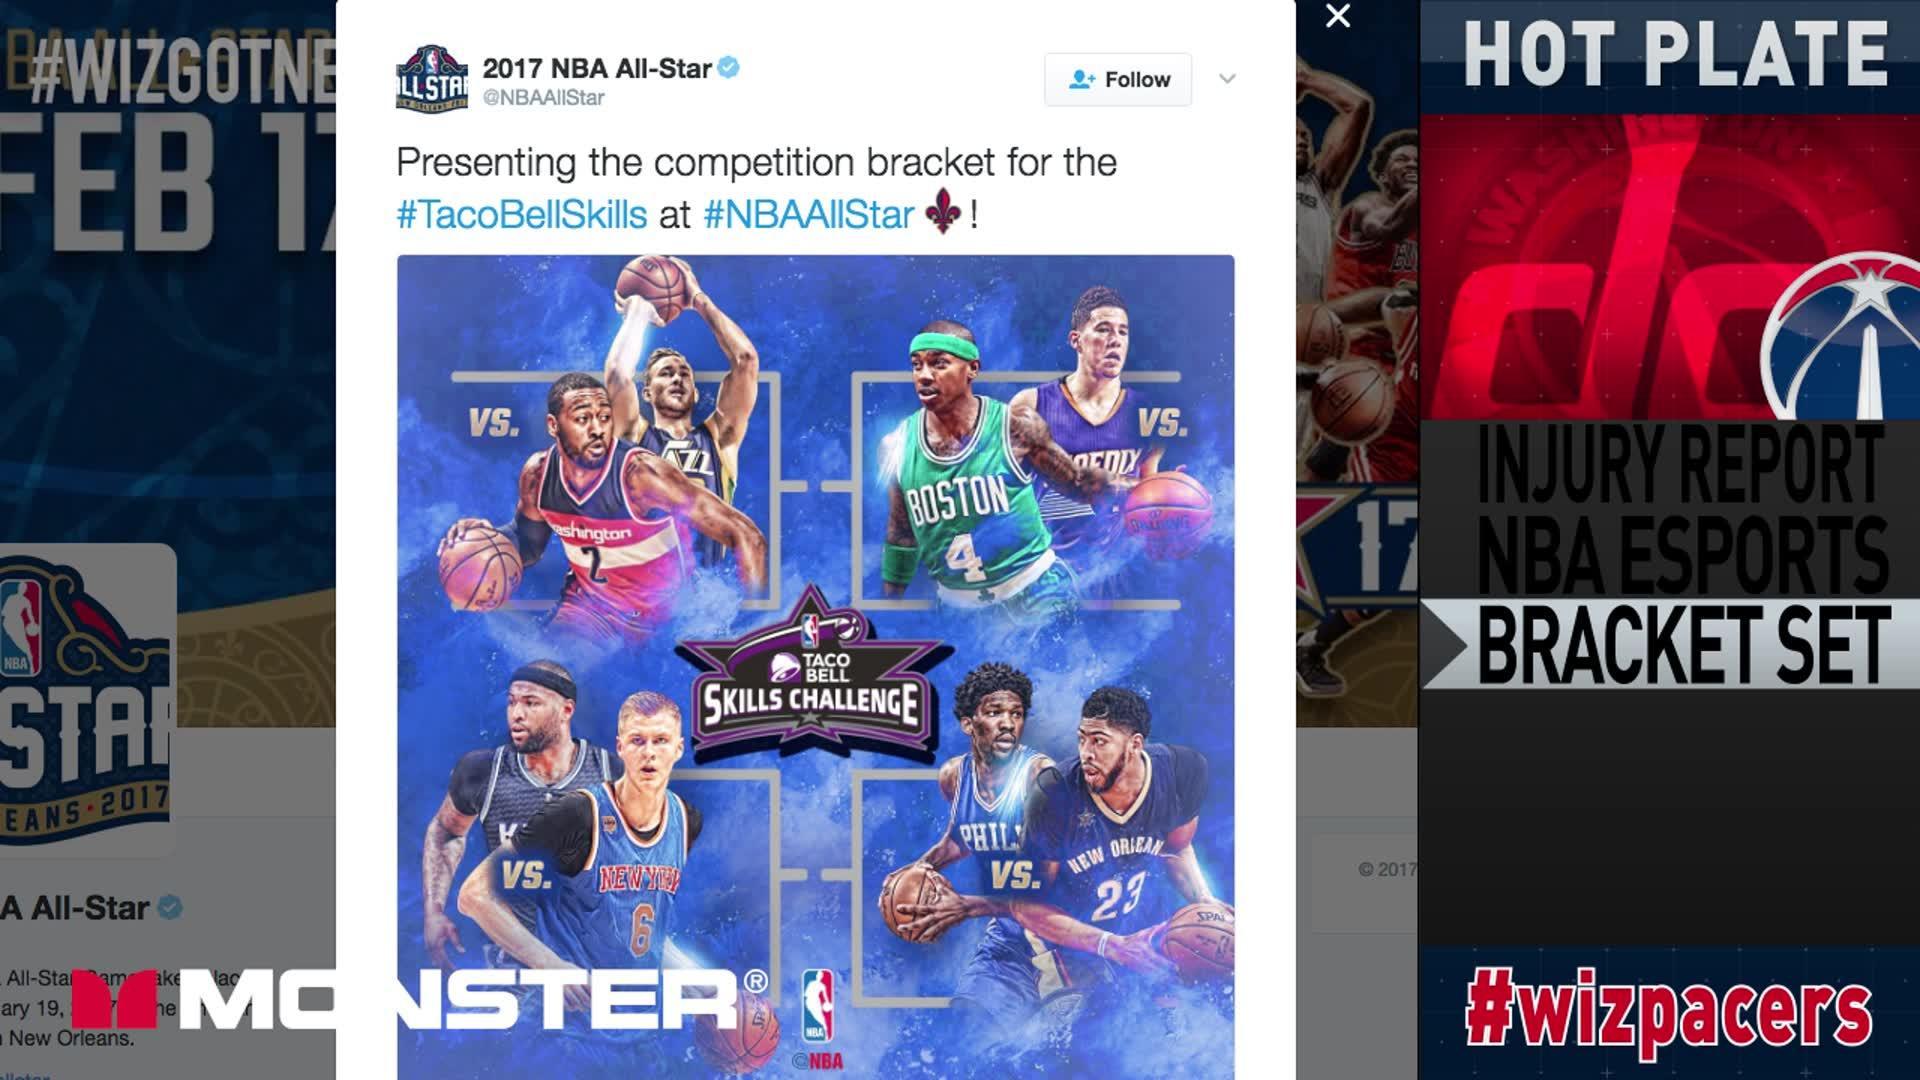 Wiz Got Next: Wizards vs Pacers Pt 3 - 2-10-17